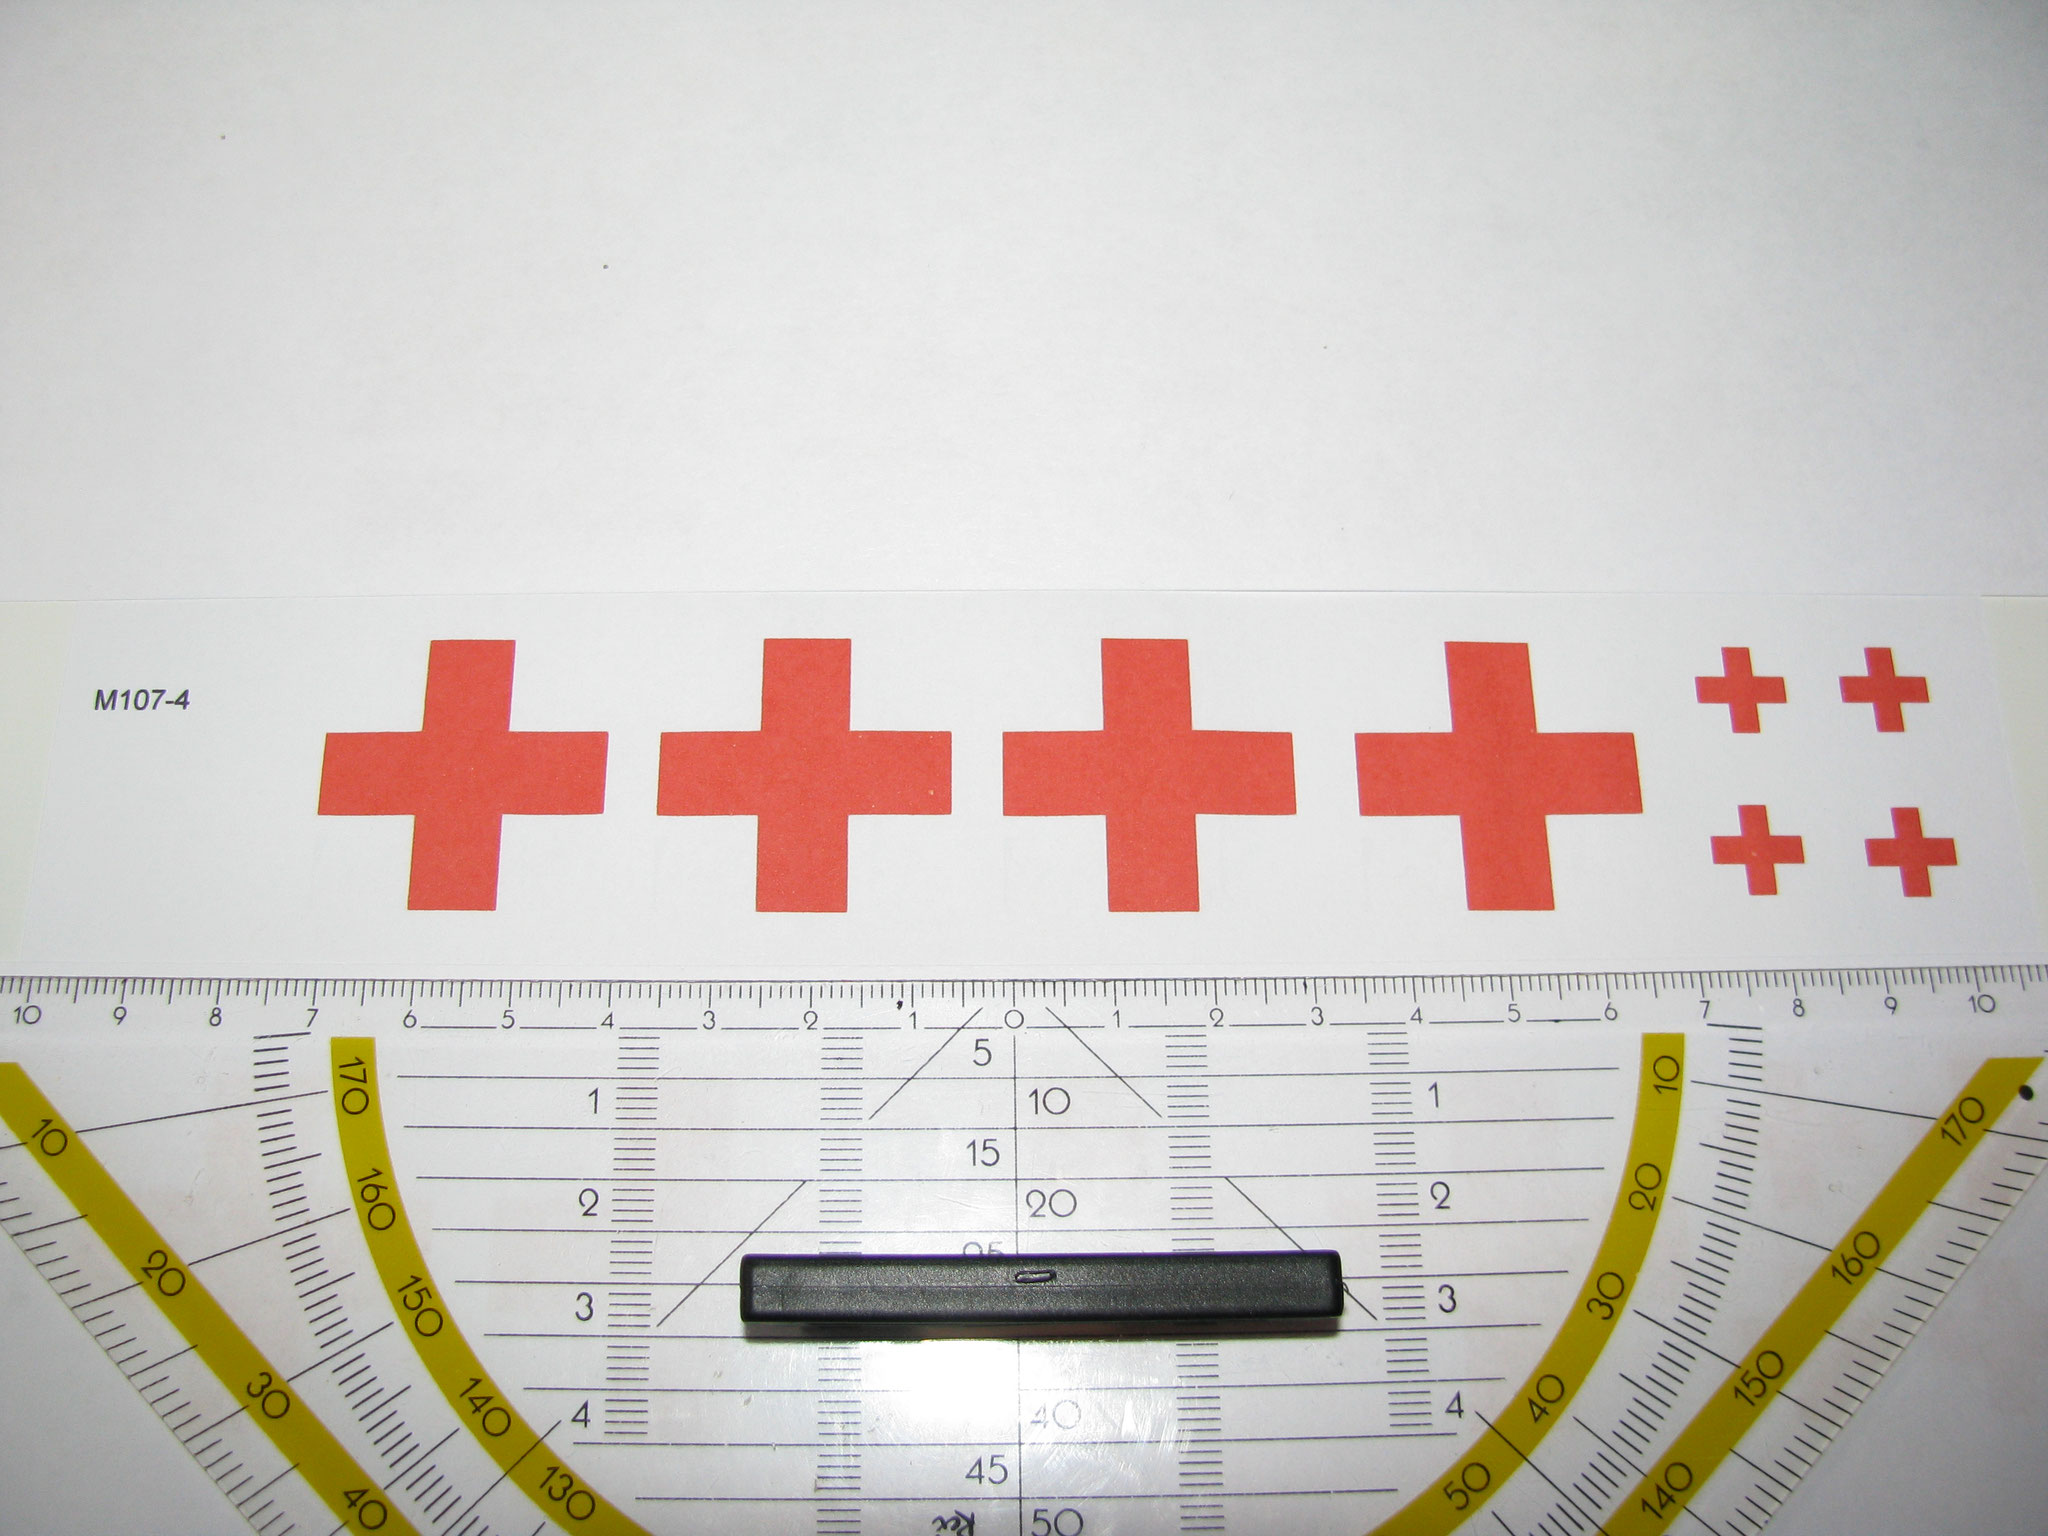 M107-4: Rotes Kreuz. 8 Decals. Max 30x30mm